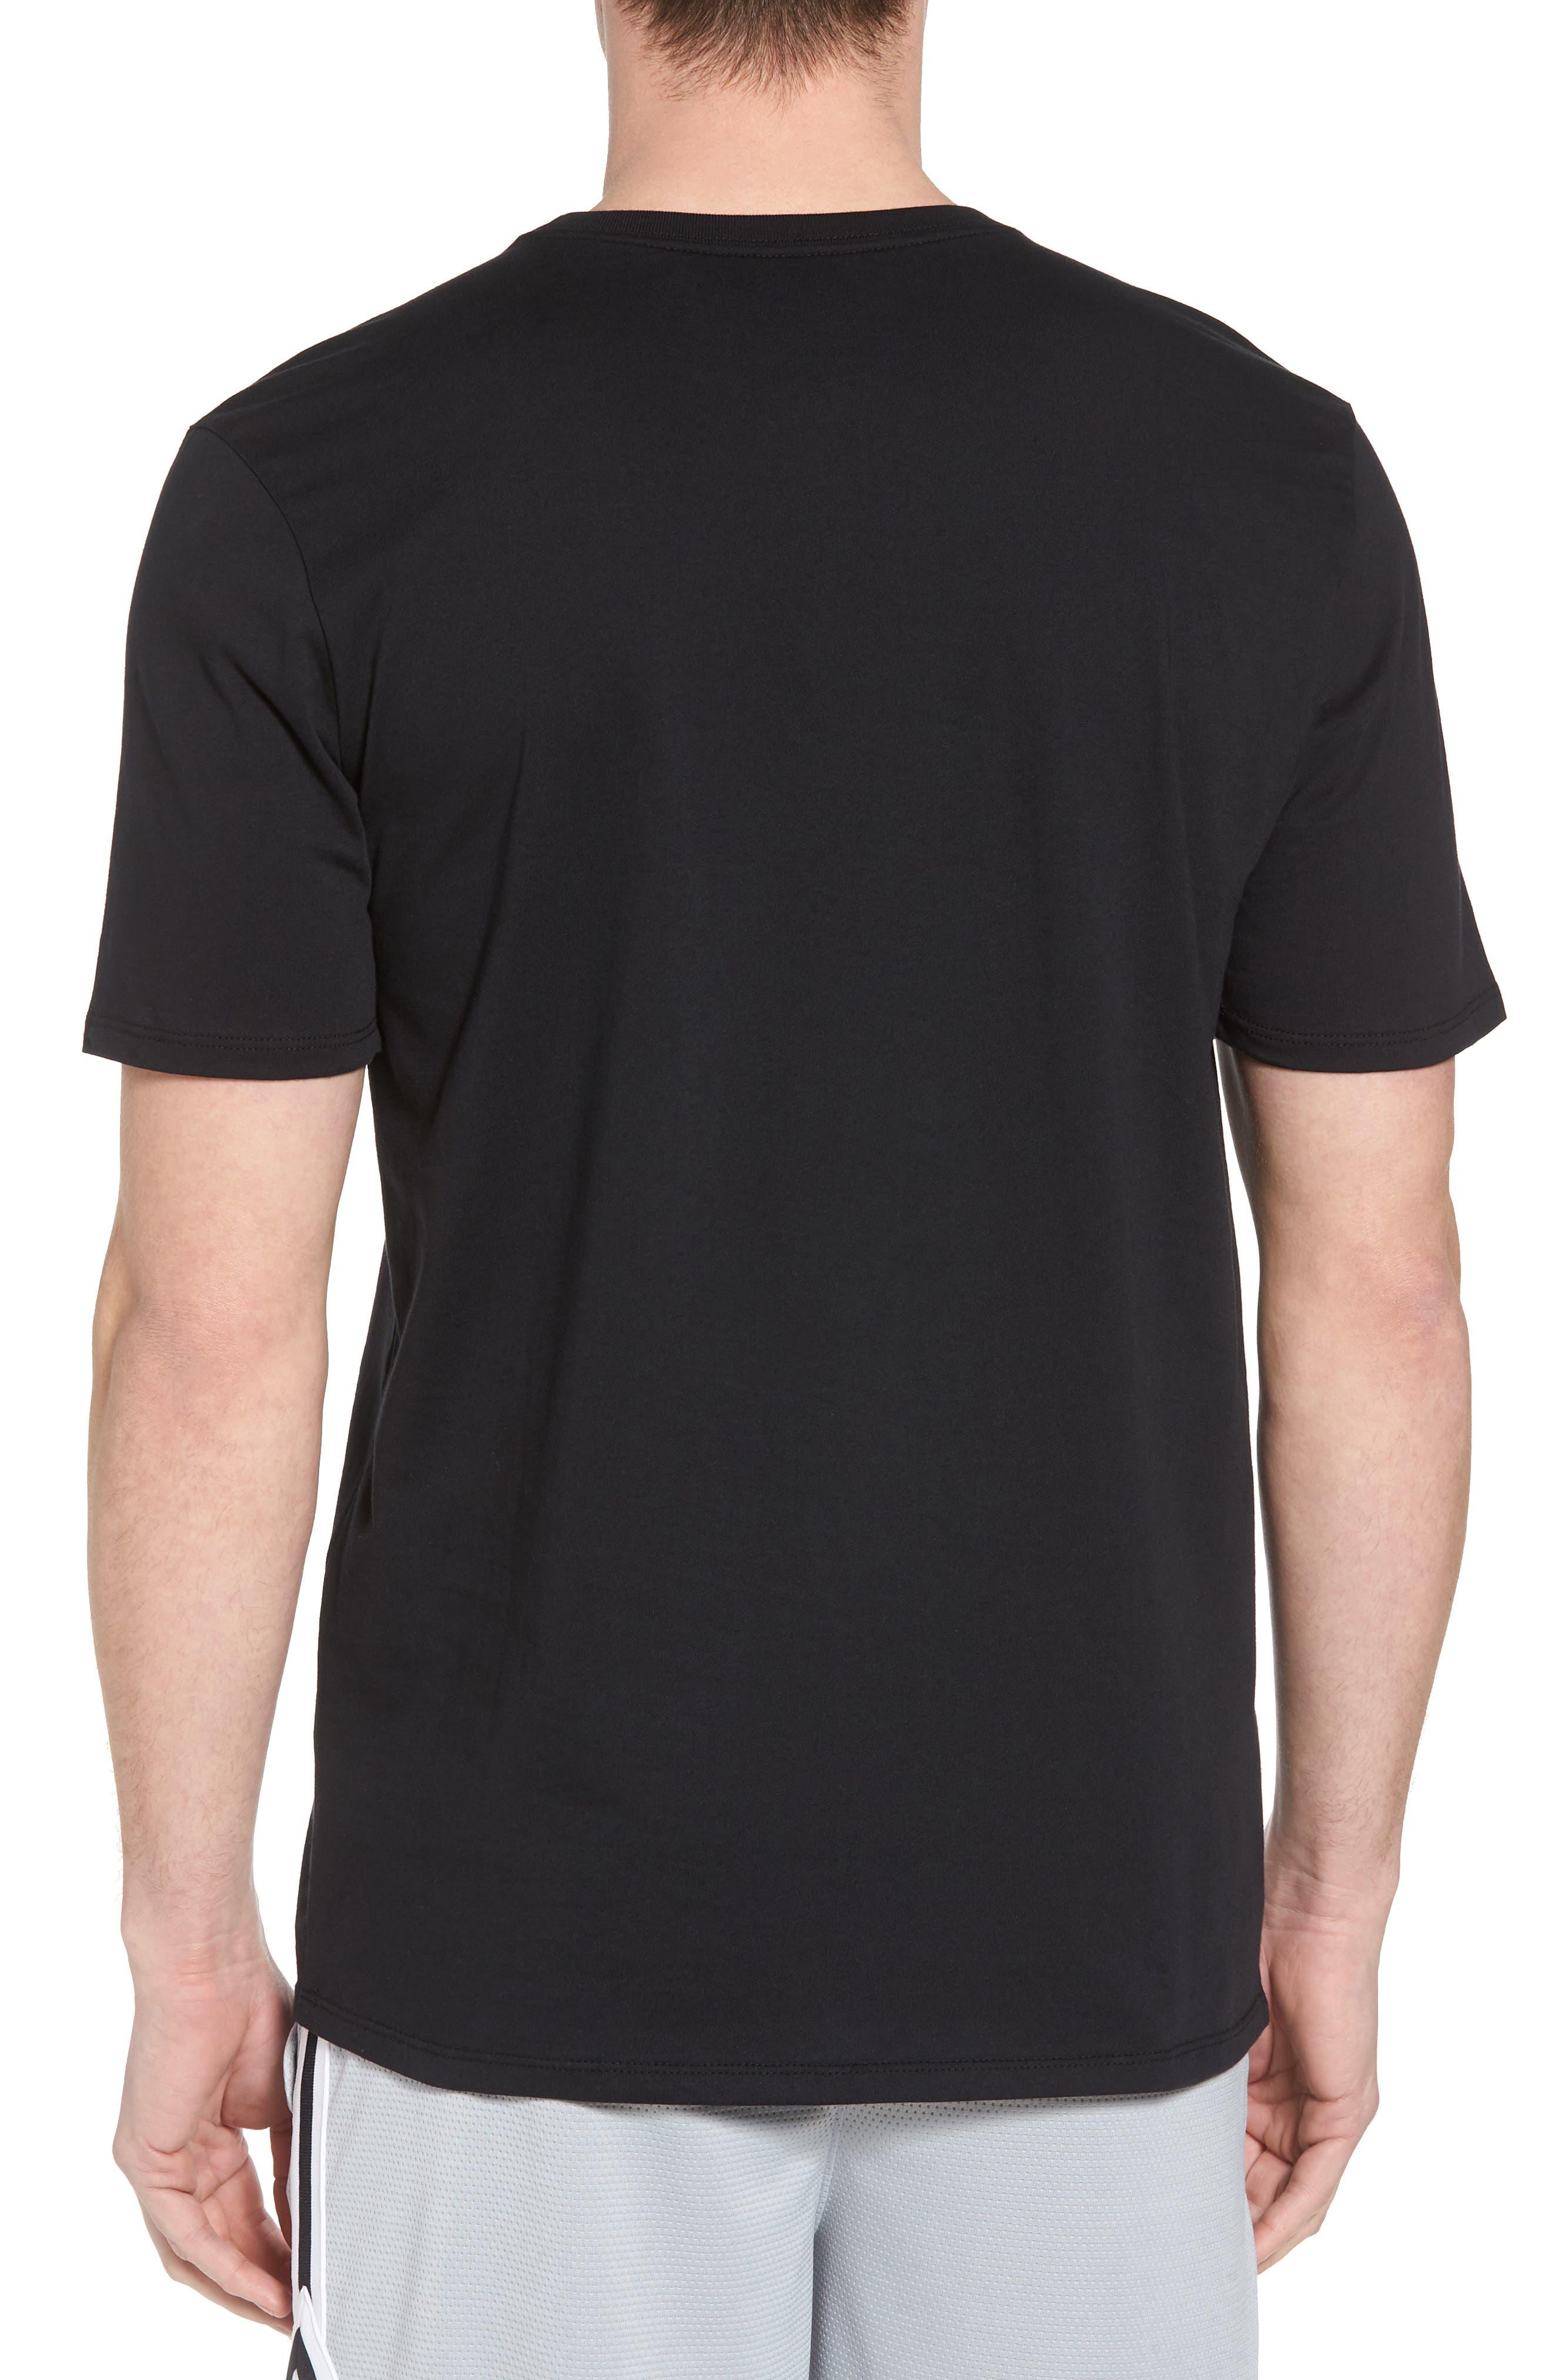 Sportswear City of Flight T-Shirt,                             Alternate thumbnail 2, color,                             Black/ White